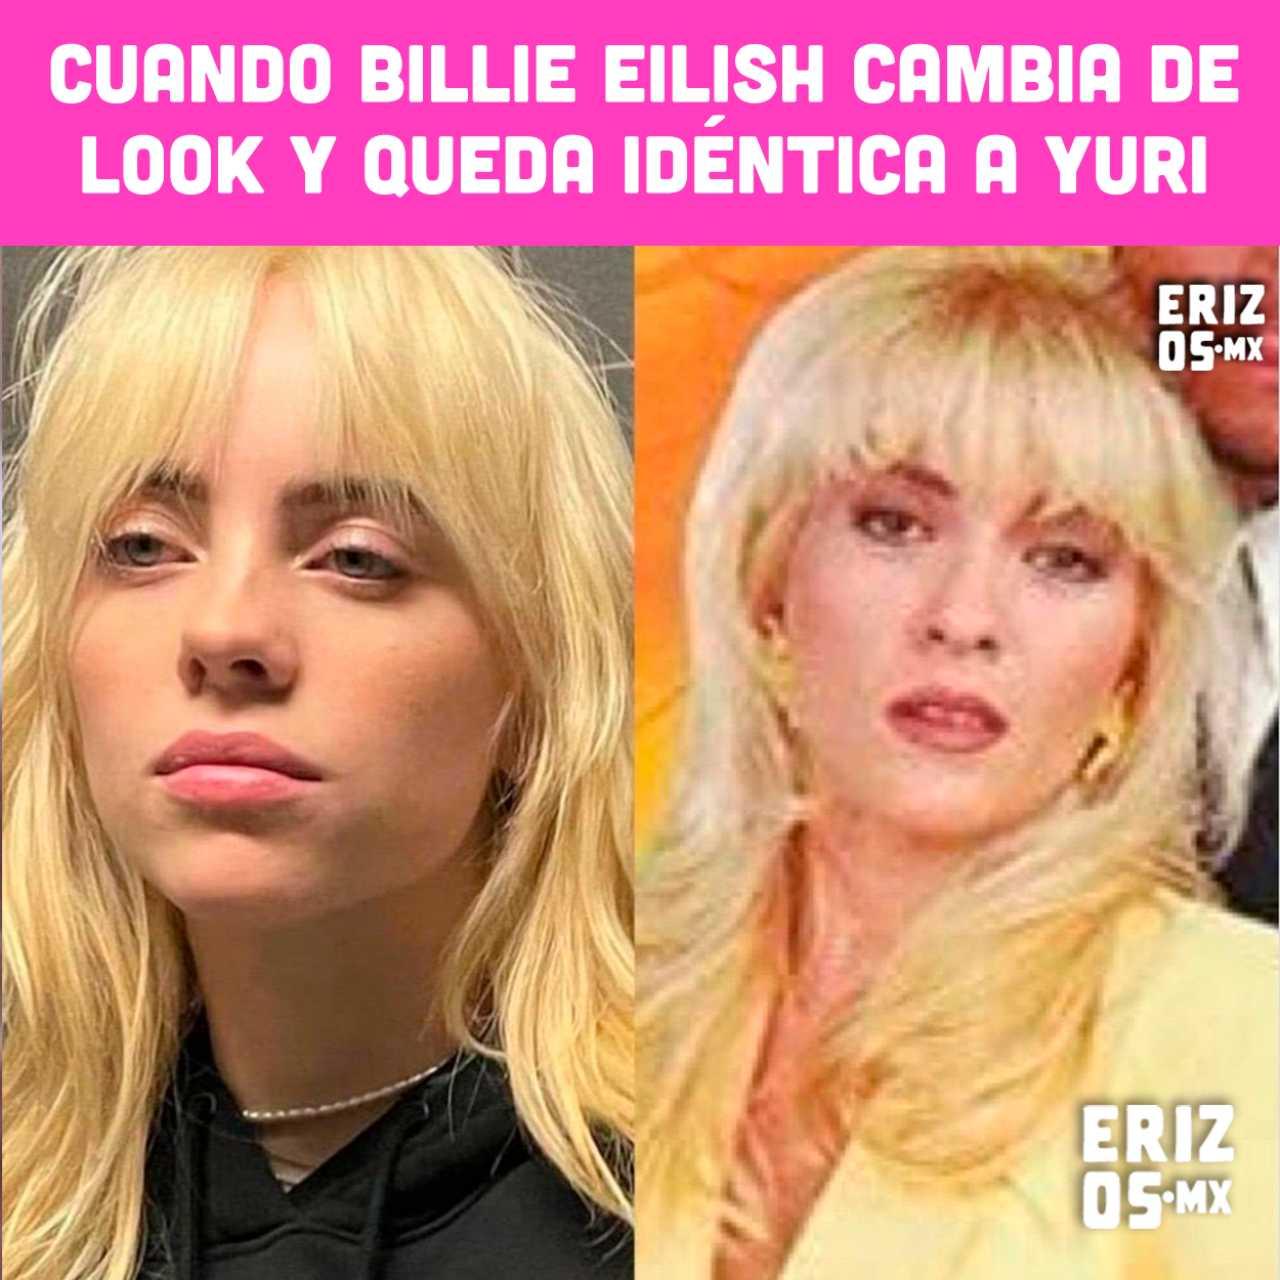 Meme de Billie Eilish igual a Yuri